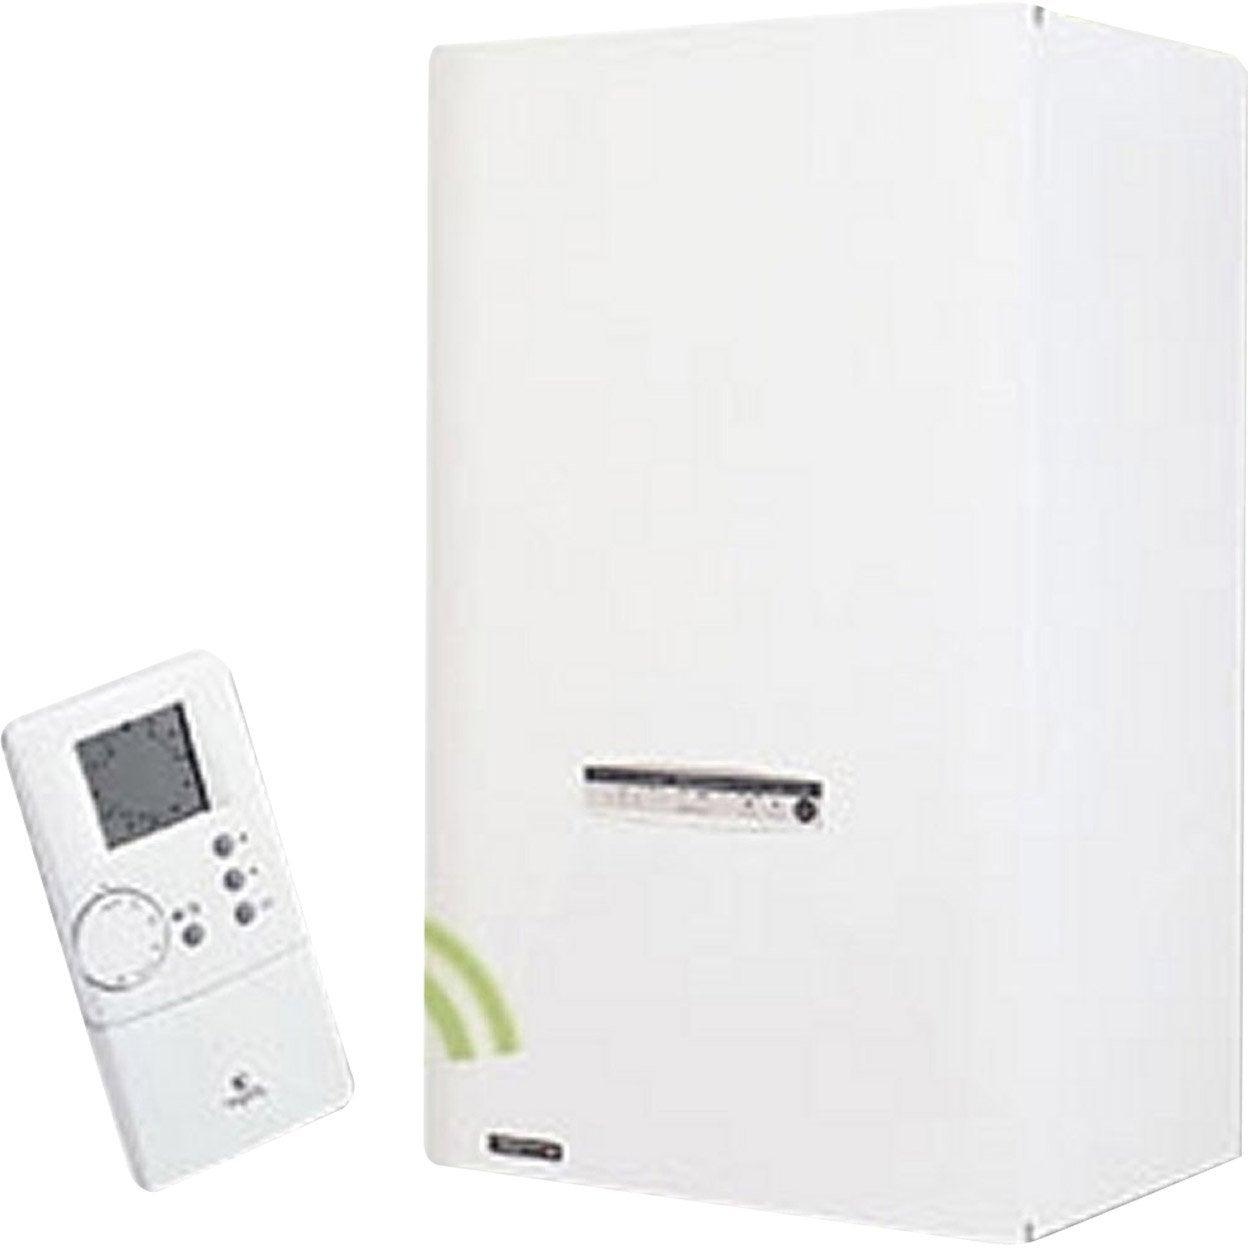 Chaudi re gaz condensation instantan e frisquet hydromotrix leroy merlin - Chaudiere gaz condensation prix ...